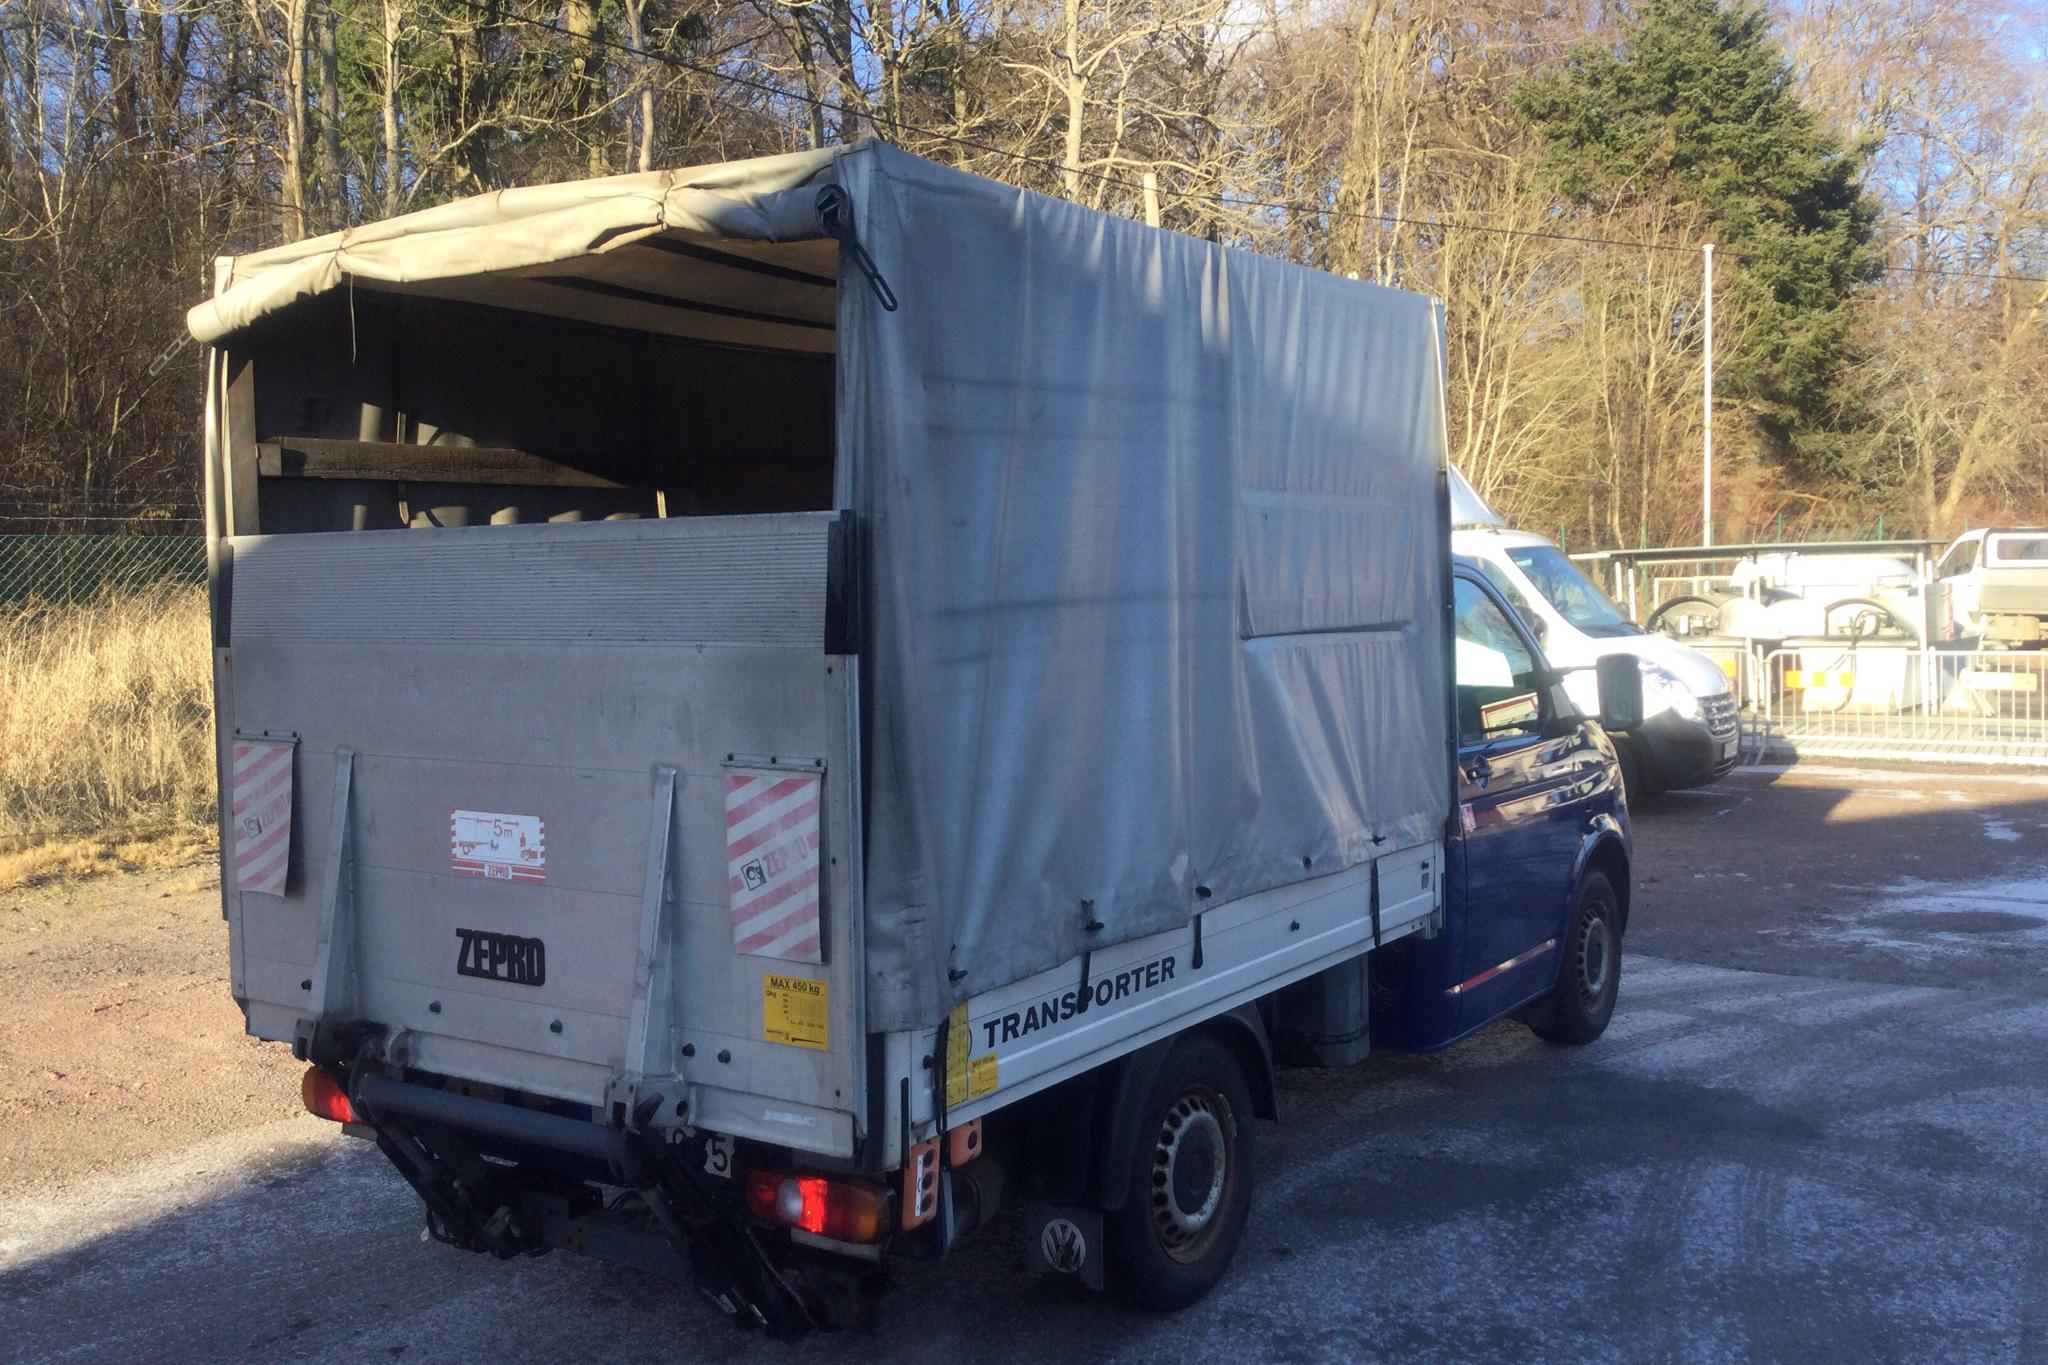 VW Transporter T5 1.9 TDI Pickup (84hk) - 13 524 mil - Manuell - Dark Blue - 2009